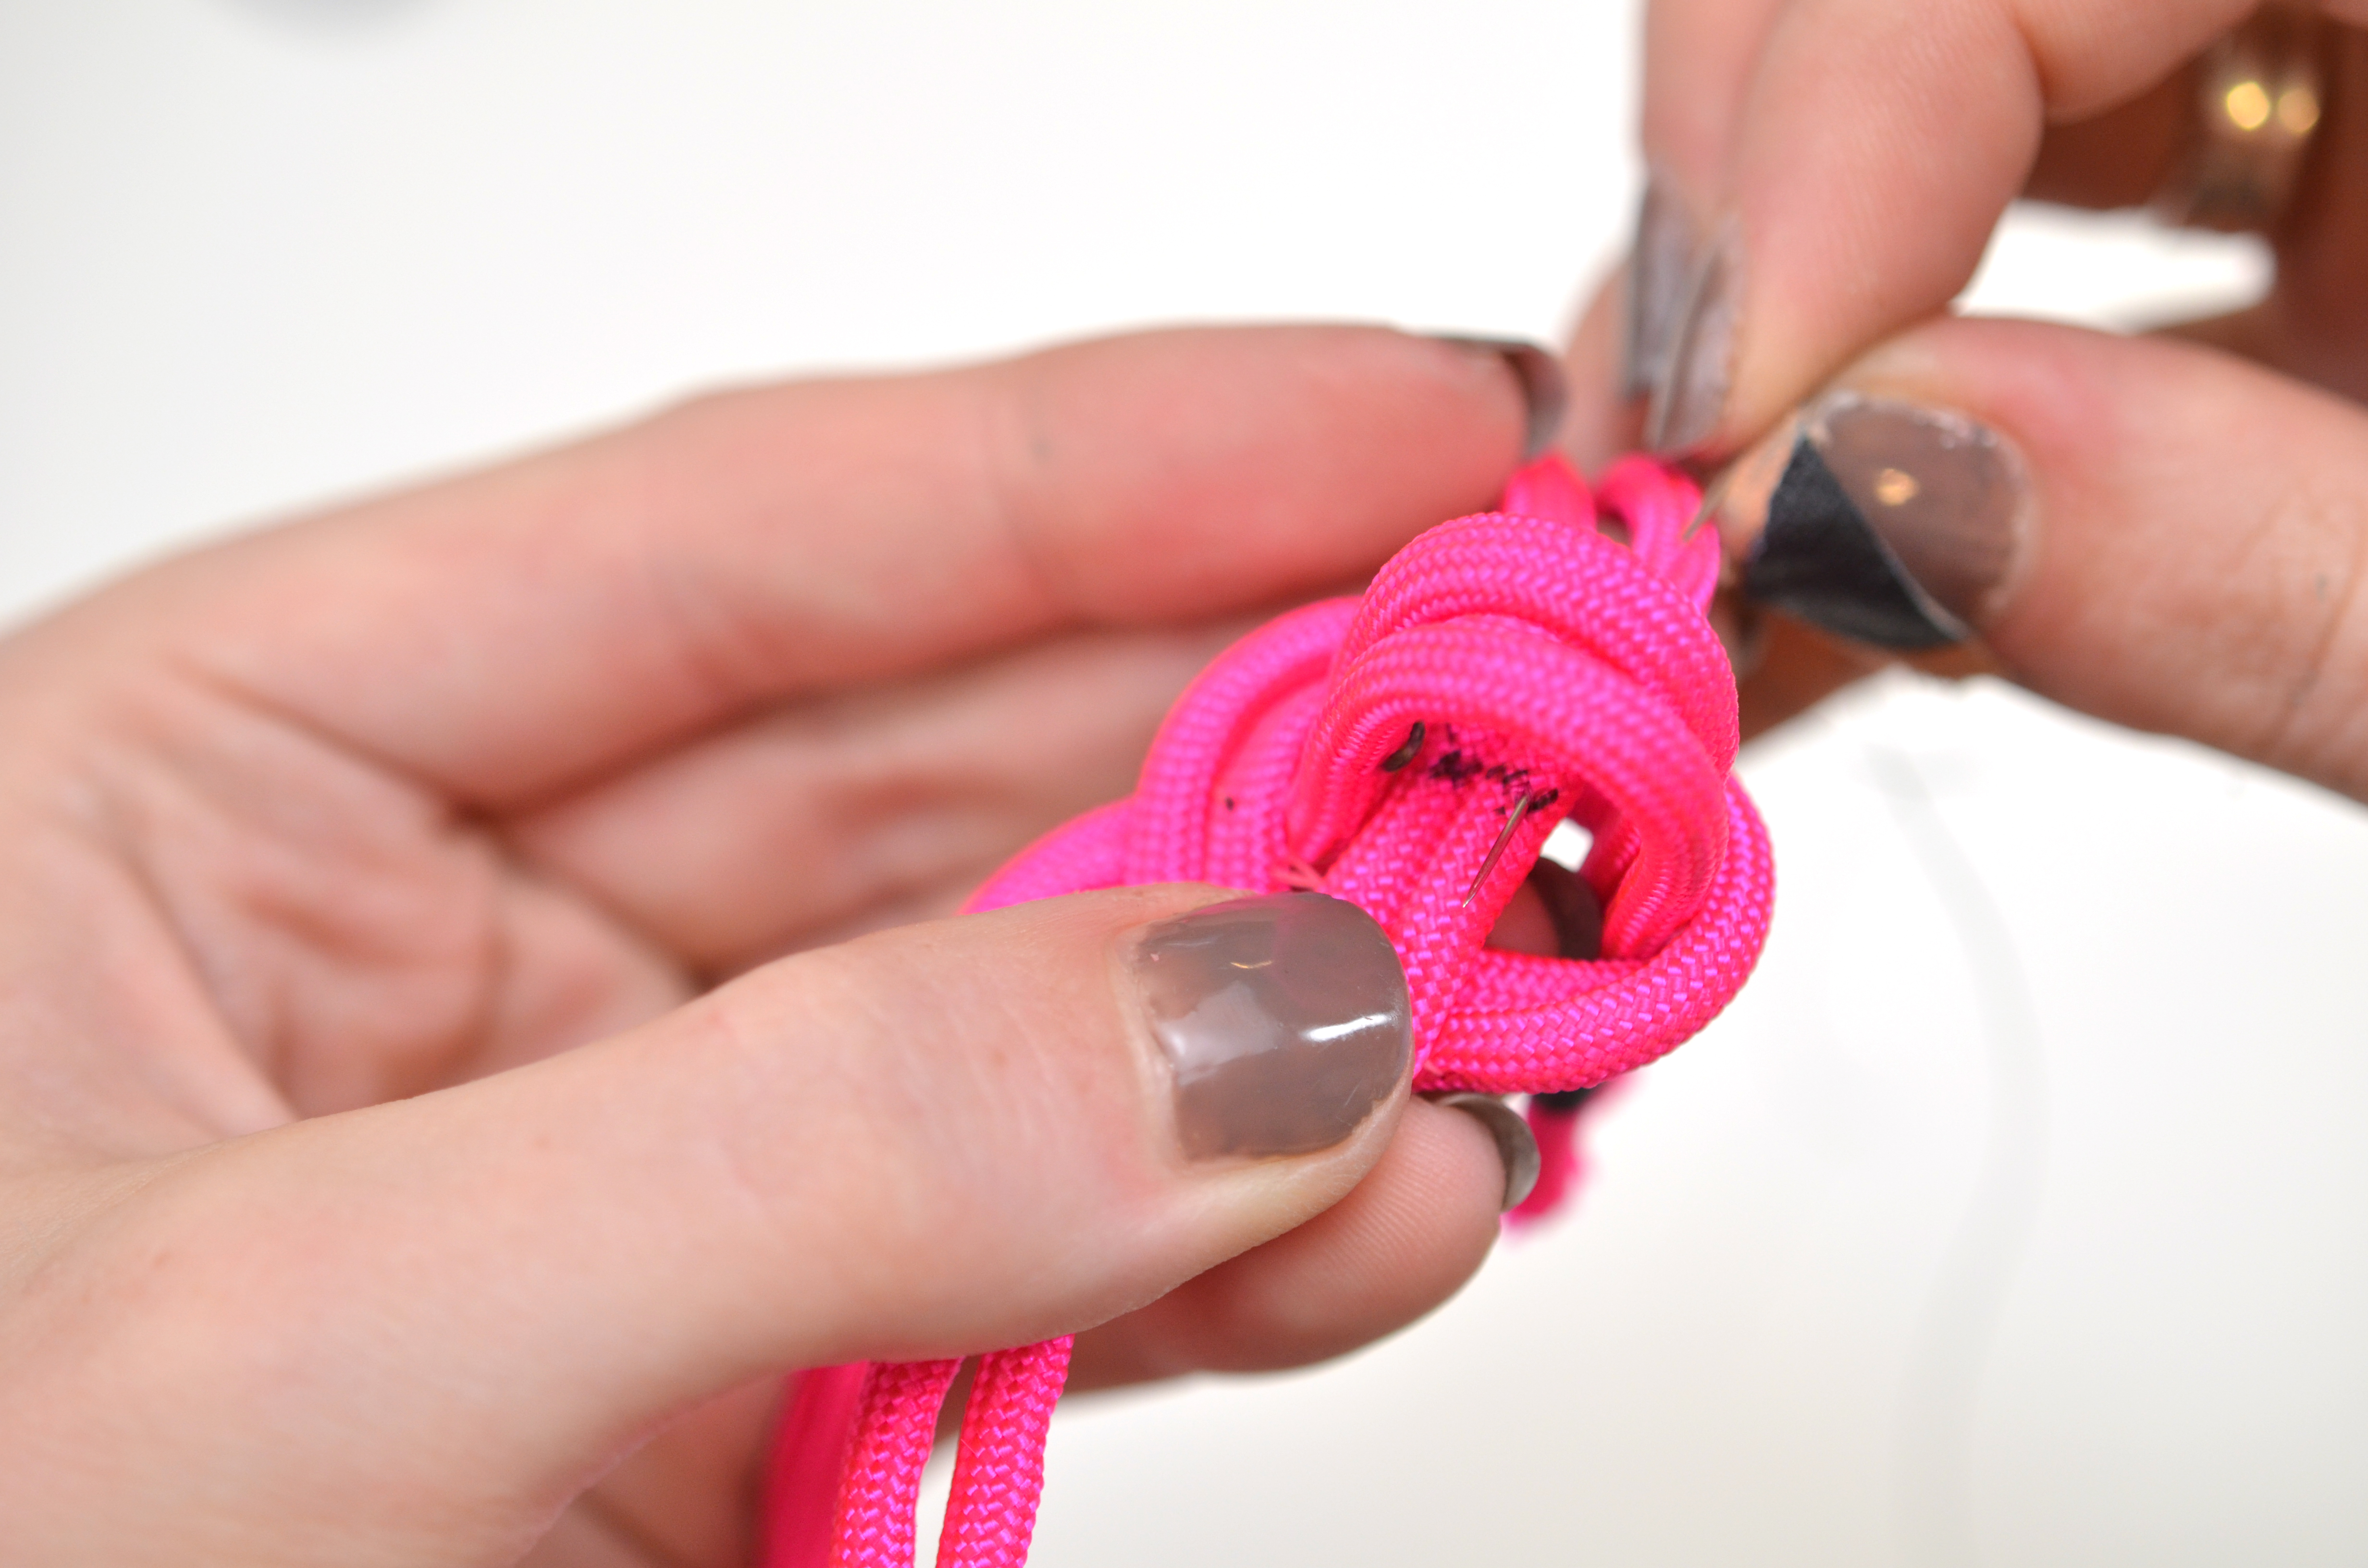 leds_nautical-paracord-led-sequin-friendship-bracelet-34.jpg